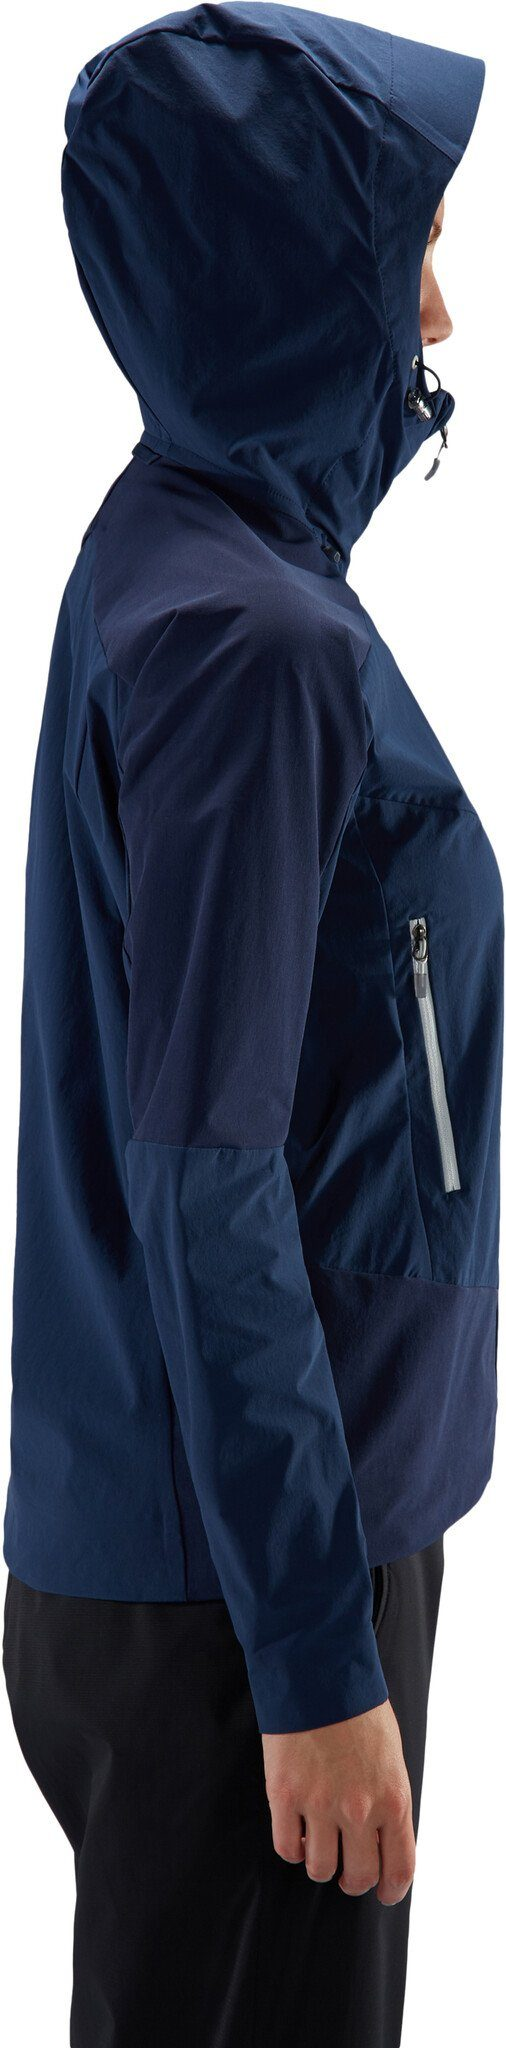 Haglöfs Outdoorjacke Skarn Hybrid Jacke Damen dw6cch